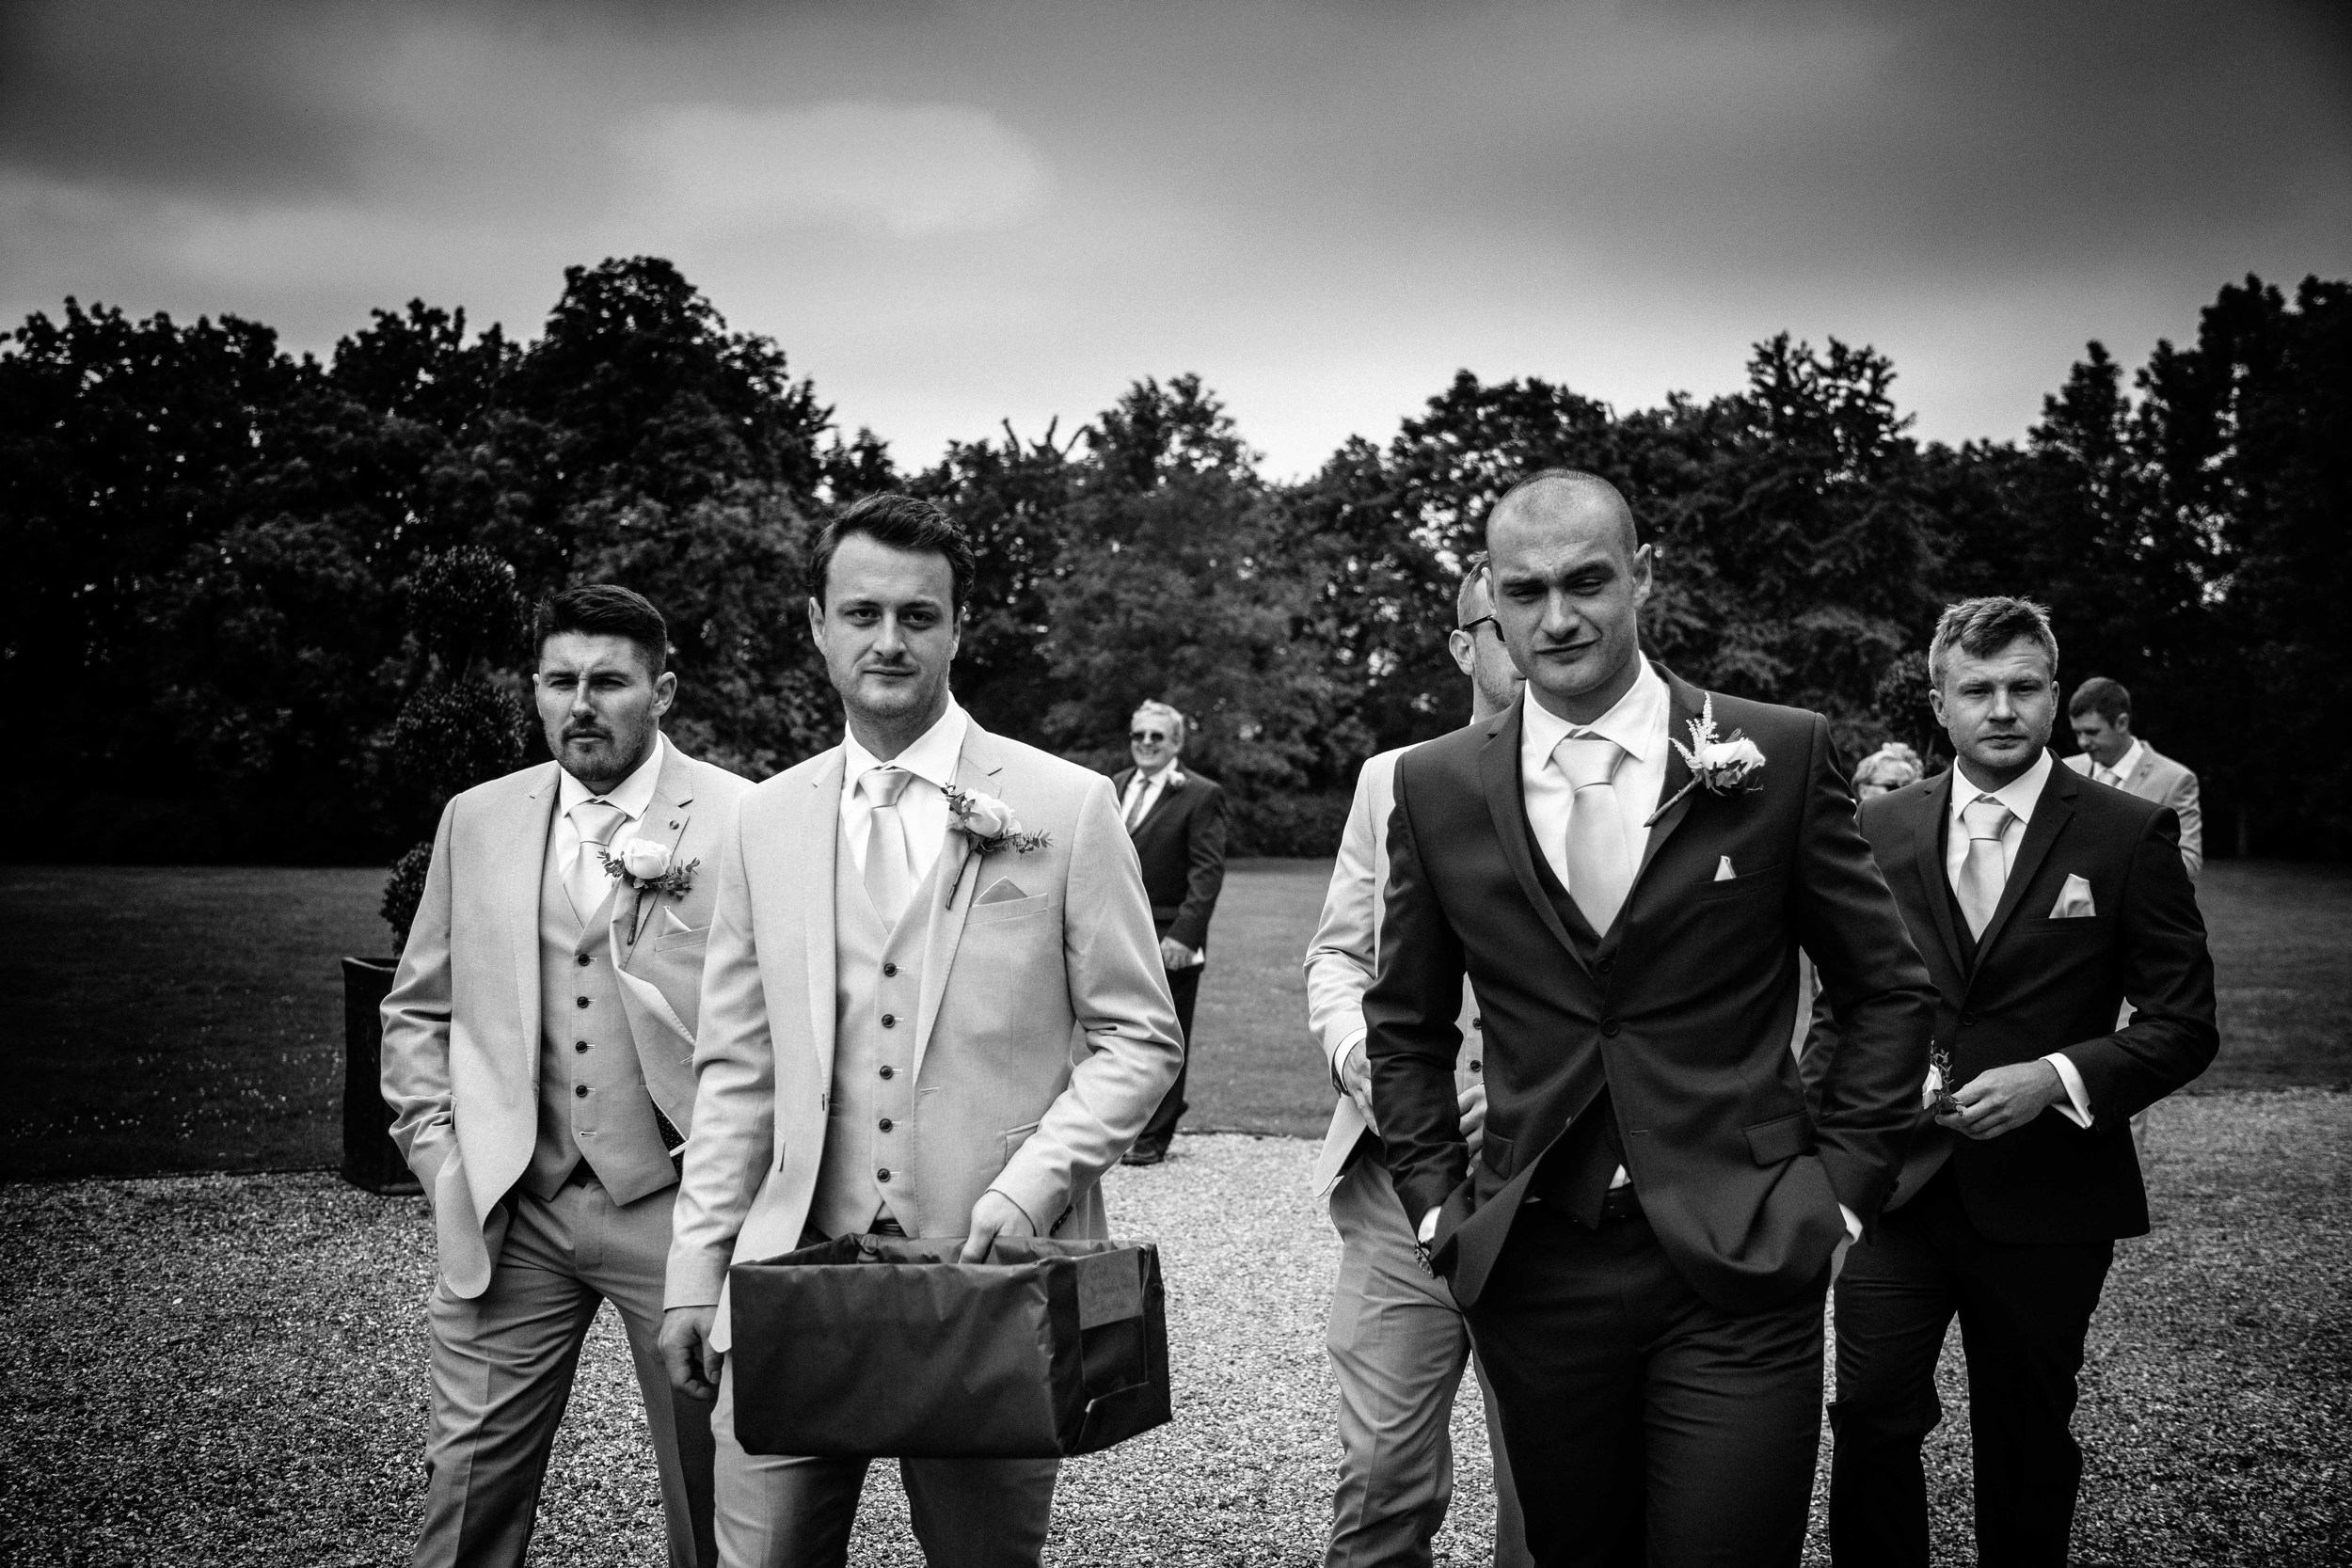 Woodlands-Park-Hotel-Cobham-Surrey-wedding-11